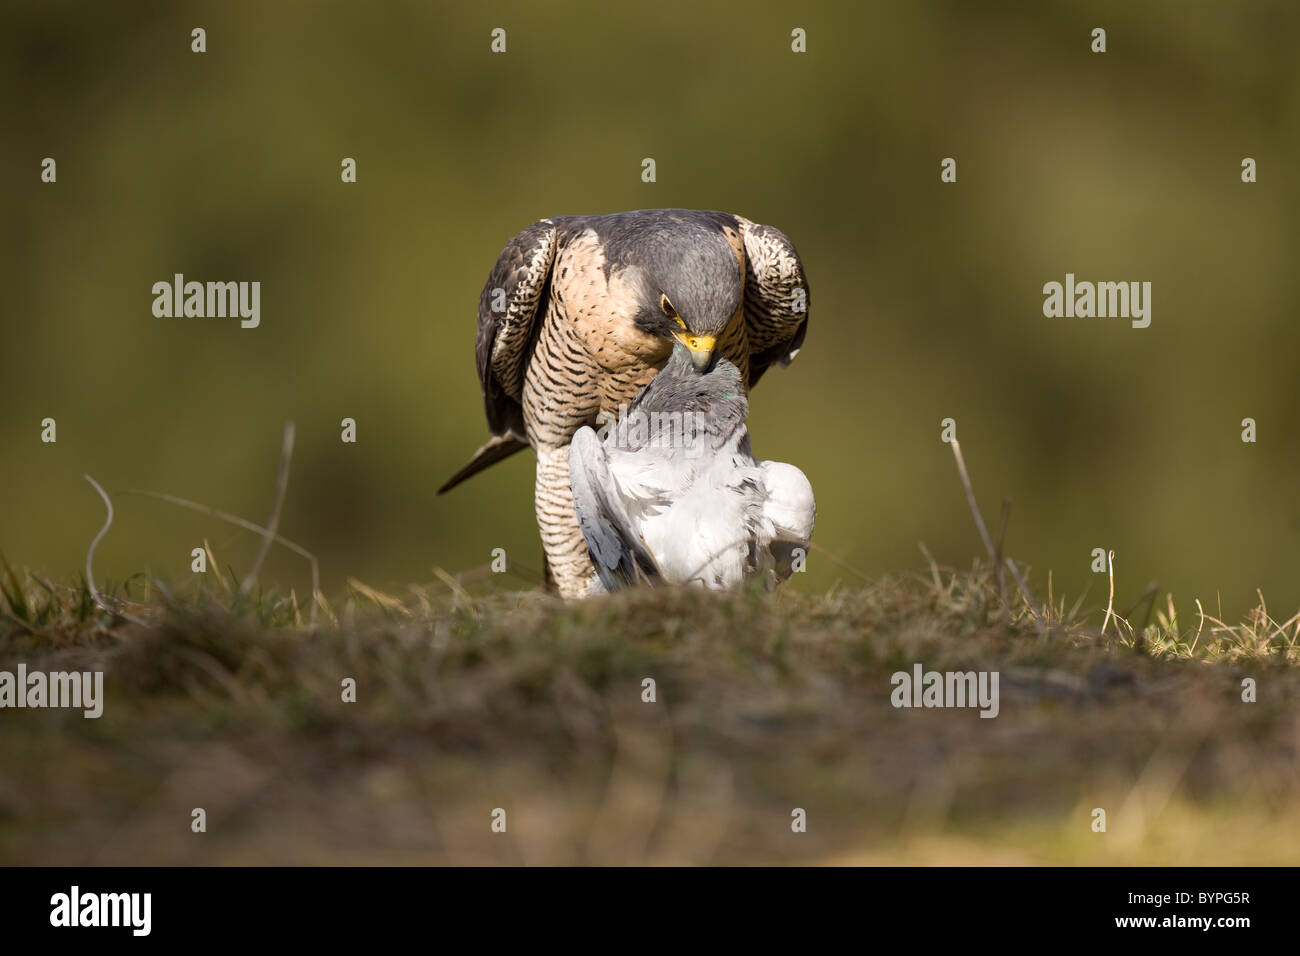 Wanderfalke (Falco peregrinus) rupft Taube - Stock Image